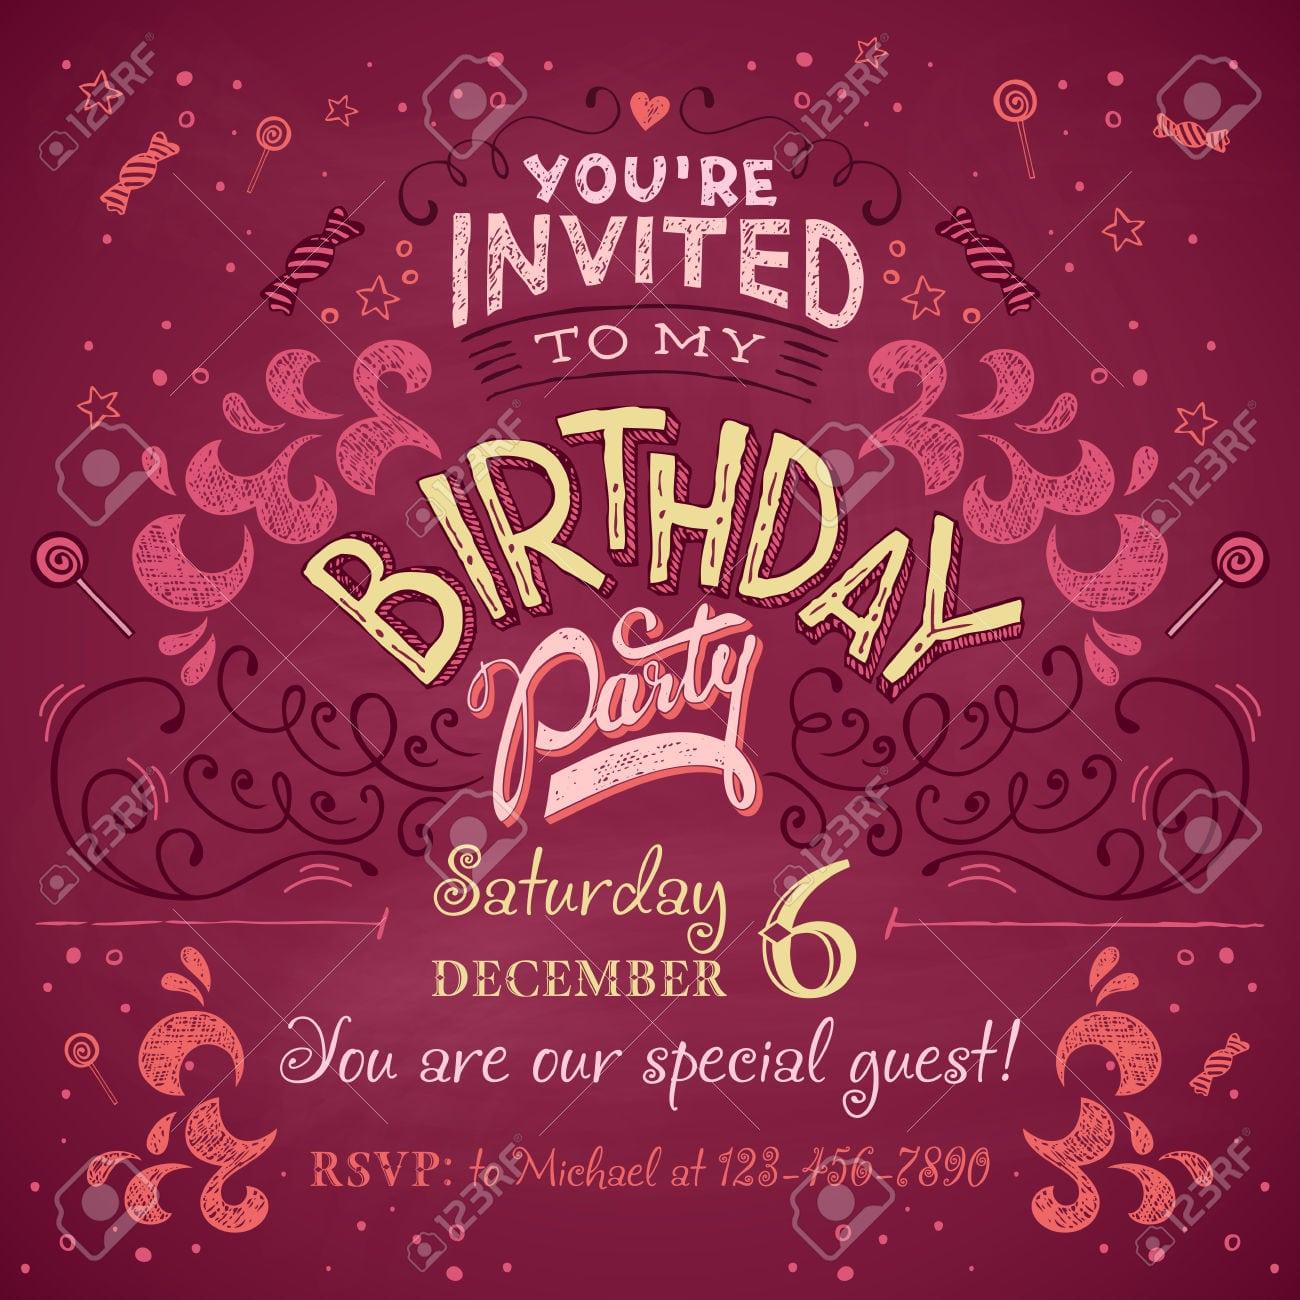 Party Invitation Card Design - Mickey Mouse Invitations Templates